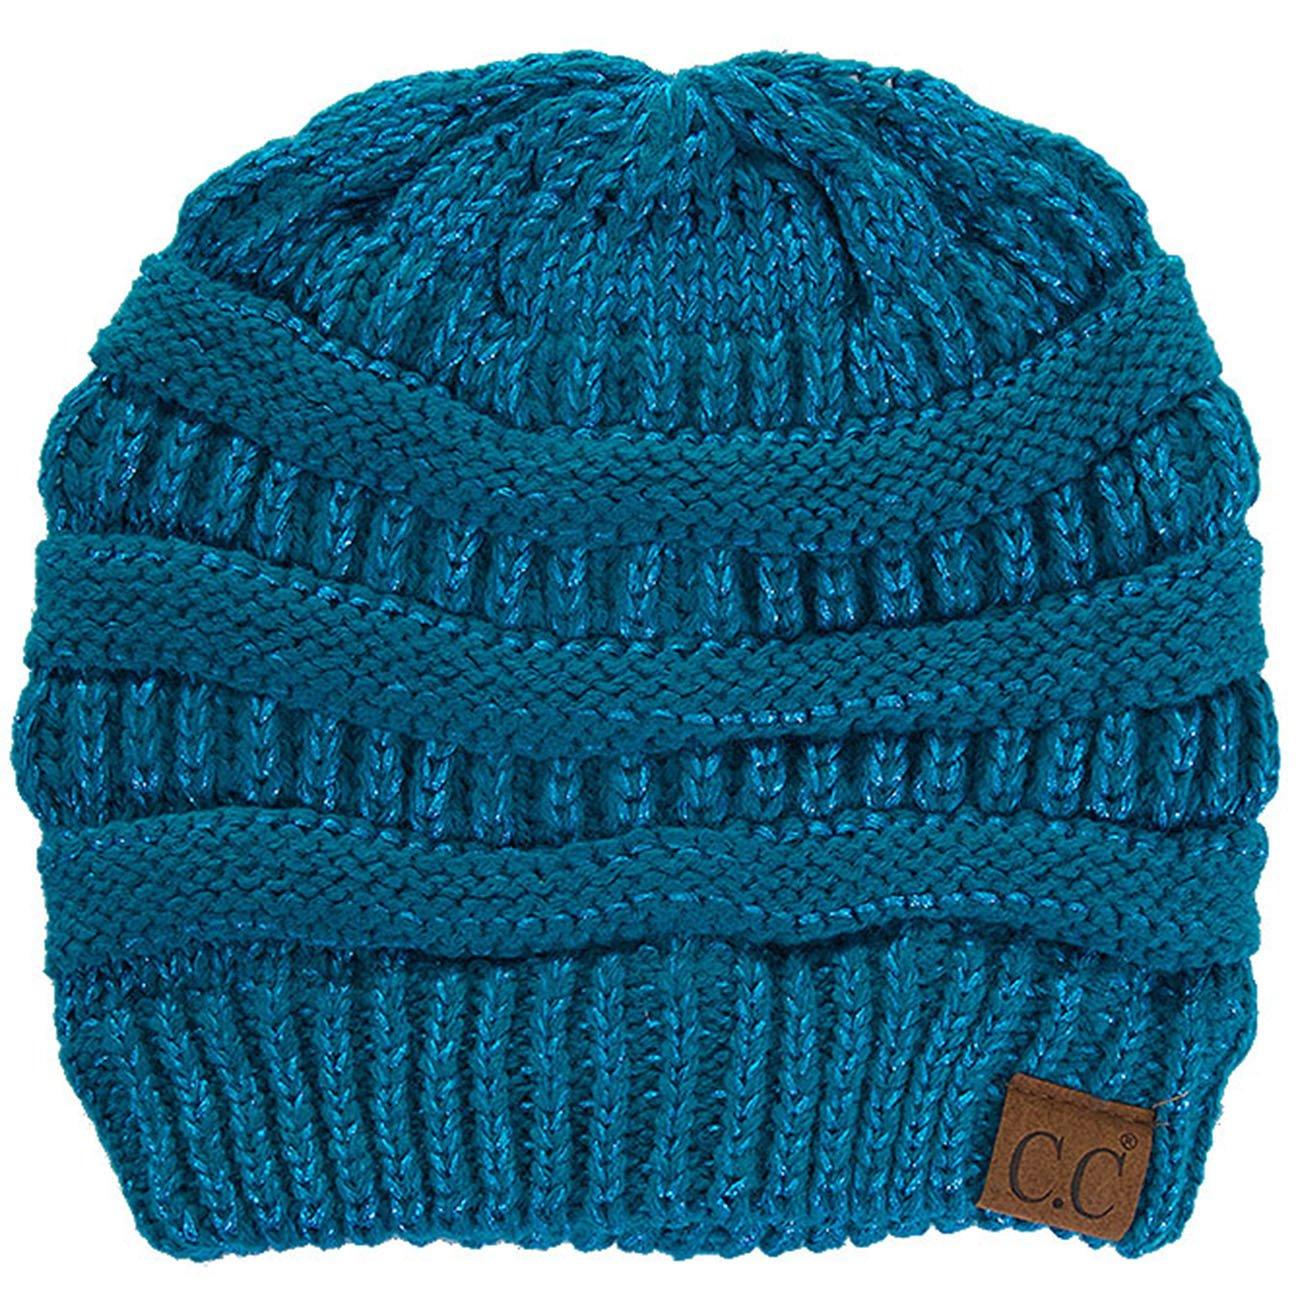 ScarvesMe C.C Trendy Warm Chunky Soft Stretch Cable Knit Beanie (Metallic Teal)